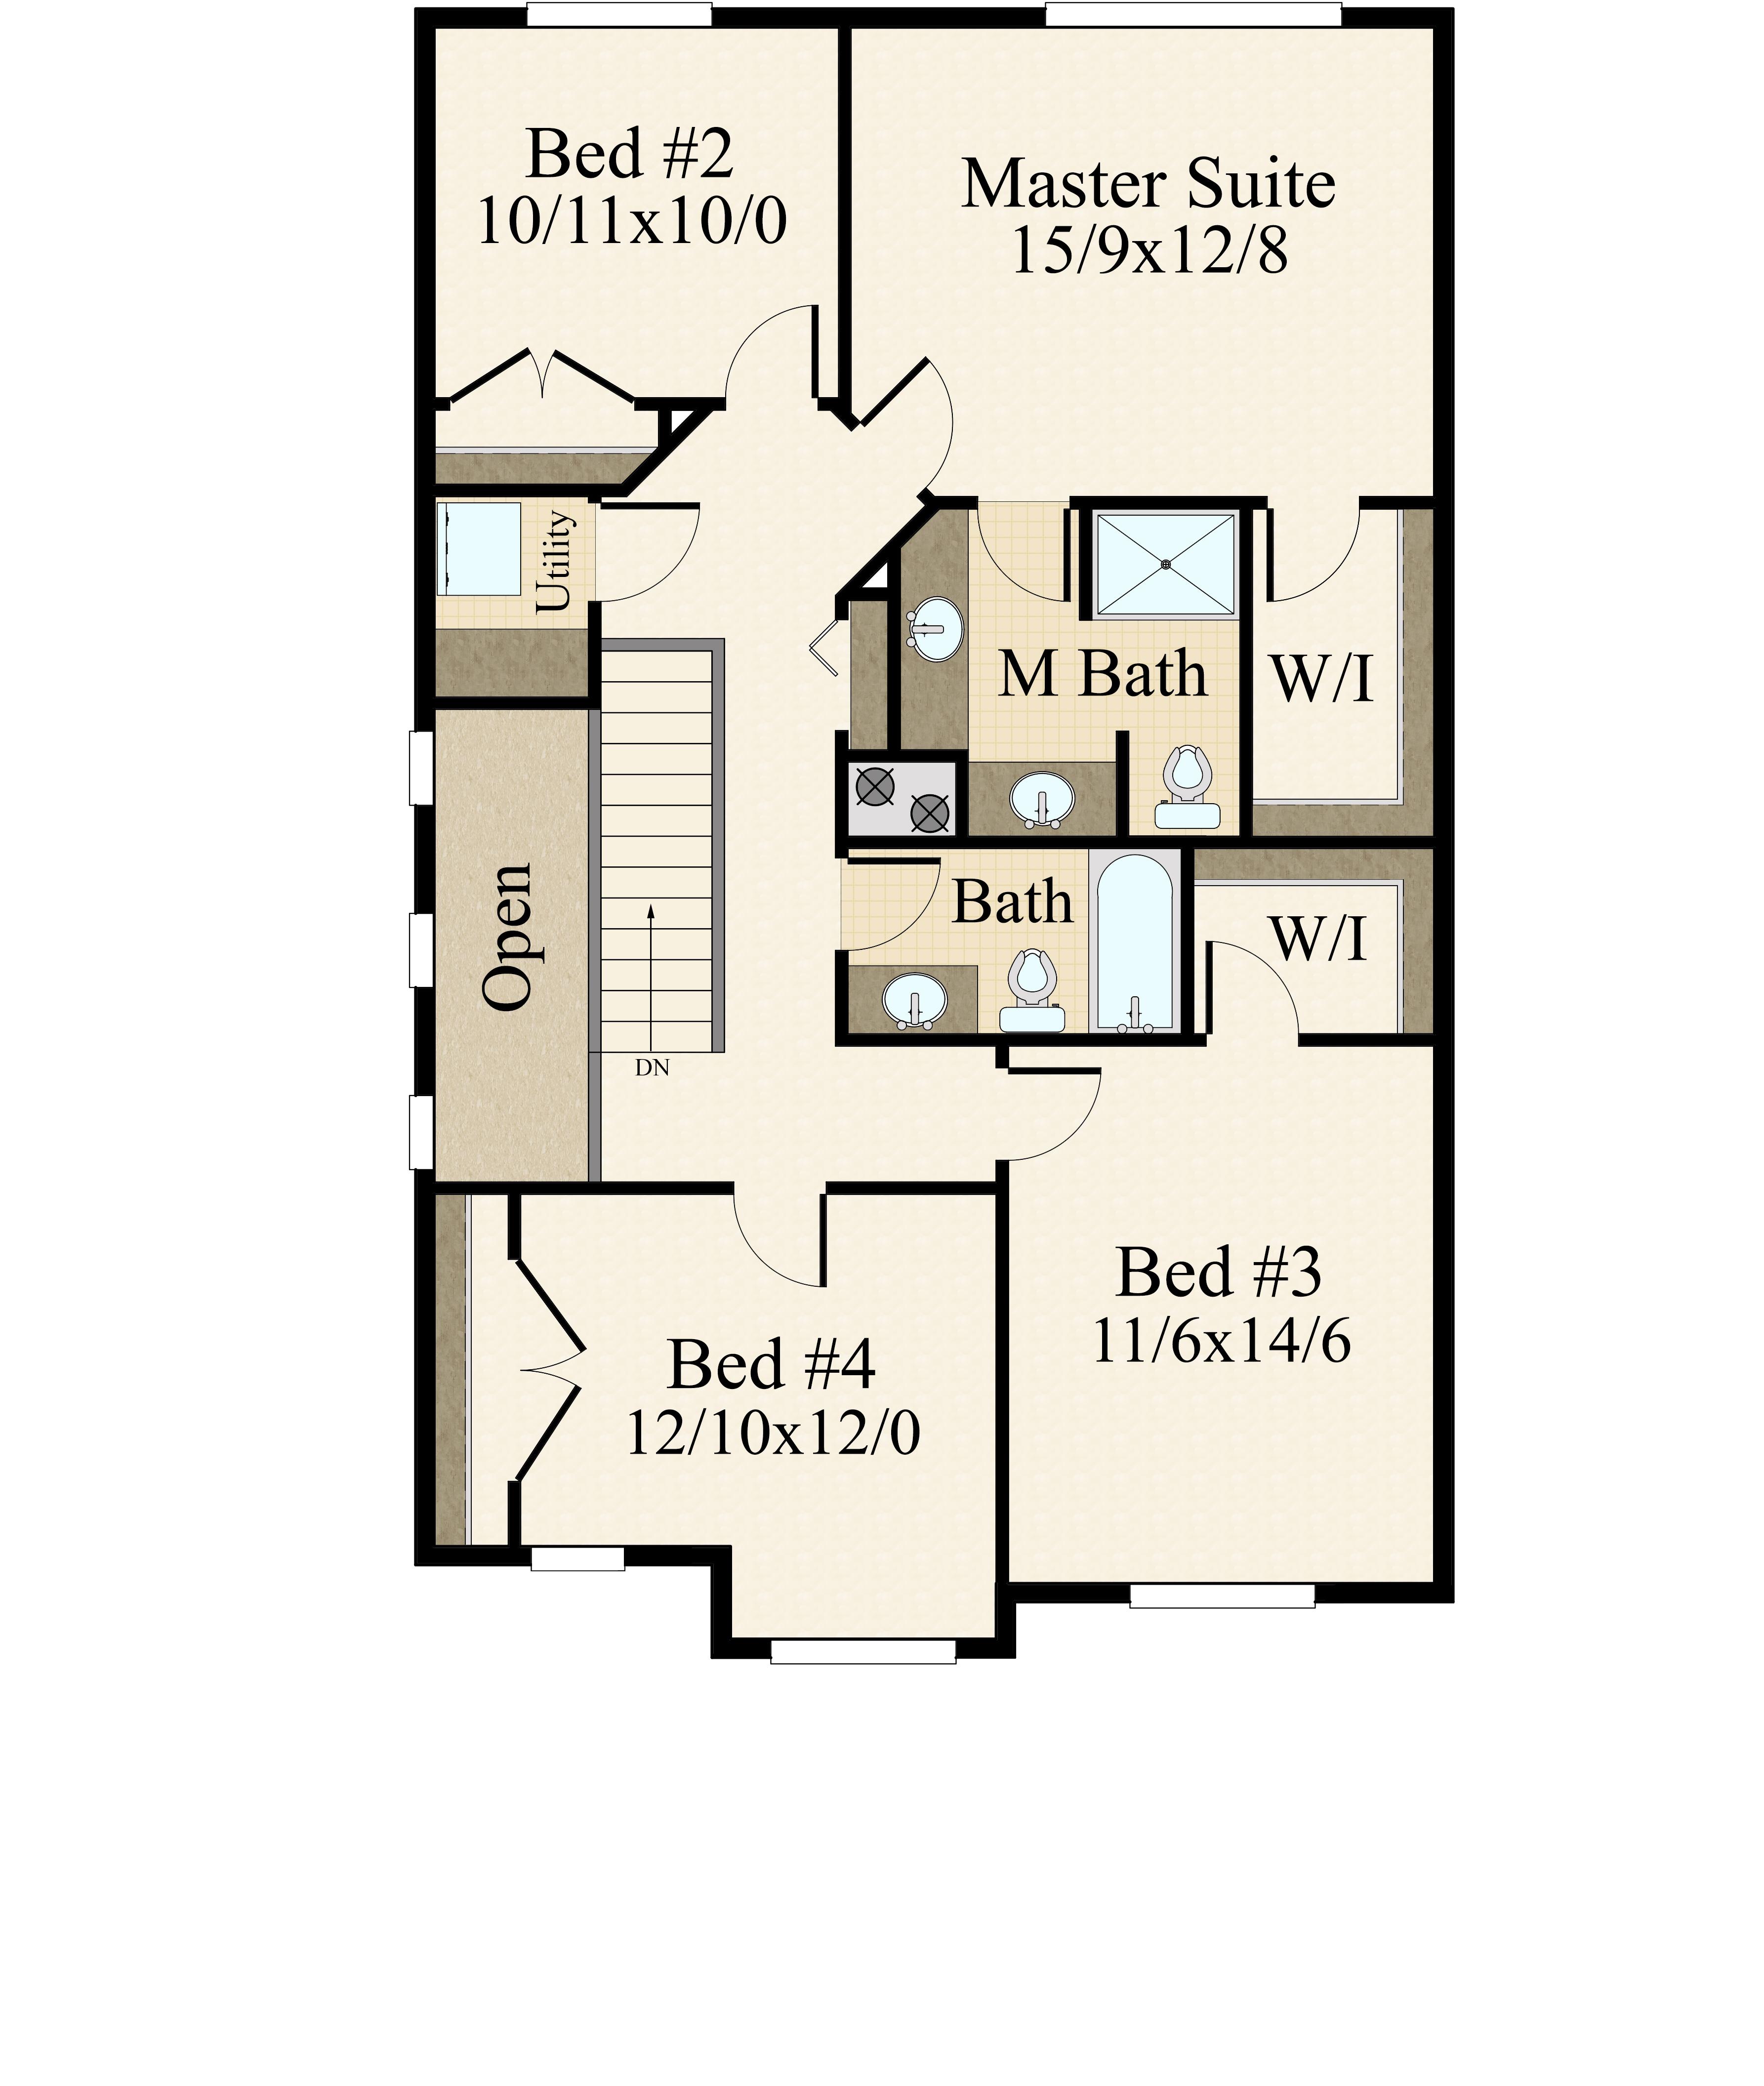 Tesla | Two Story Modern House Plan by Mark Stewart